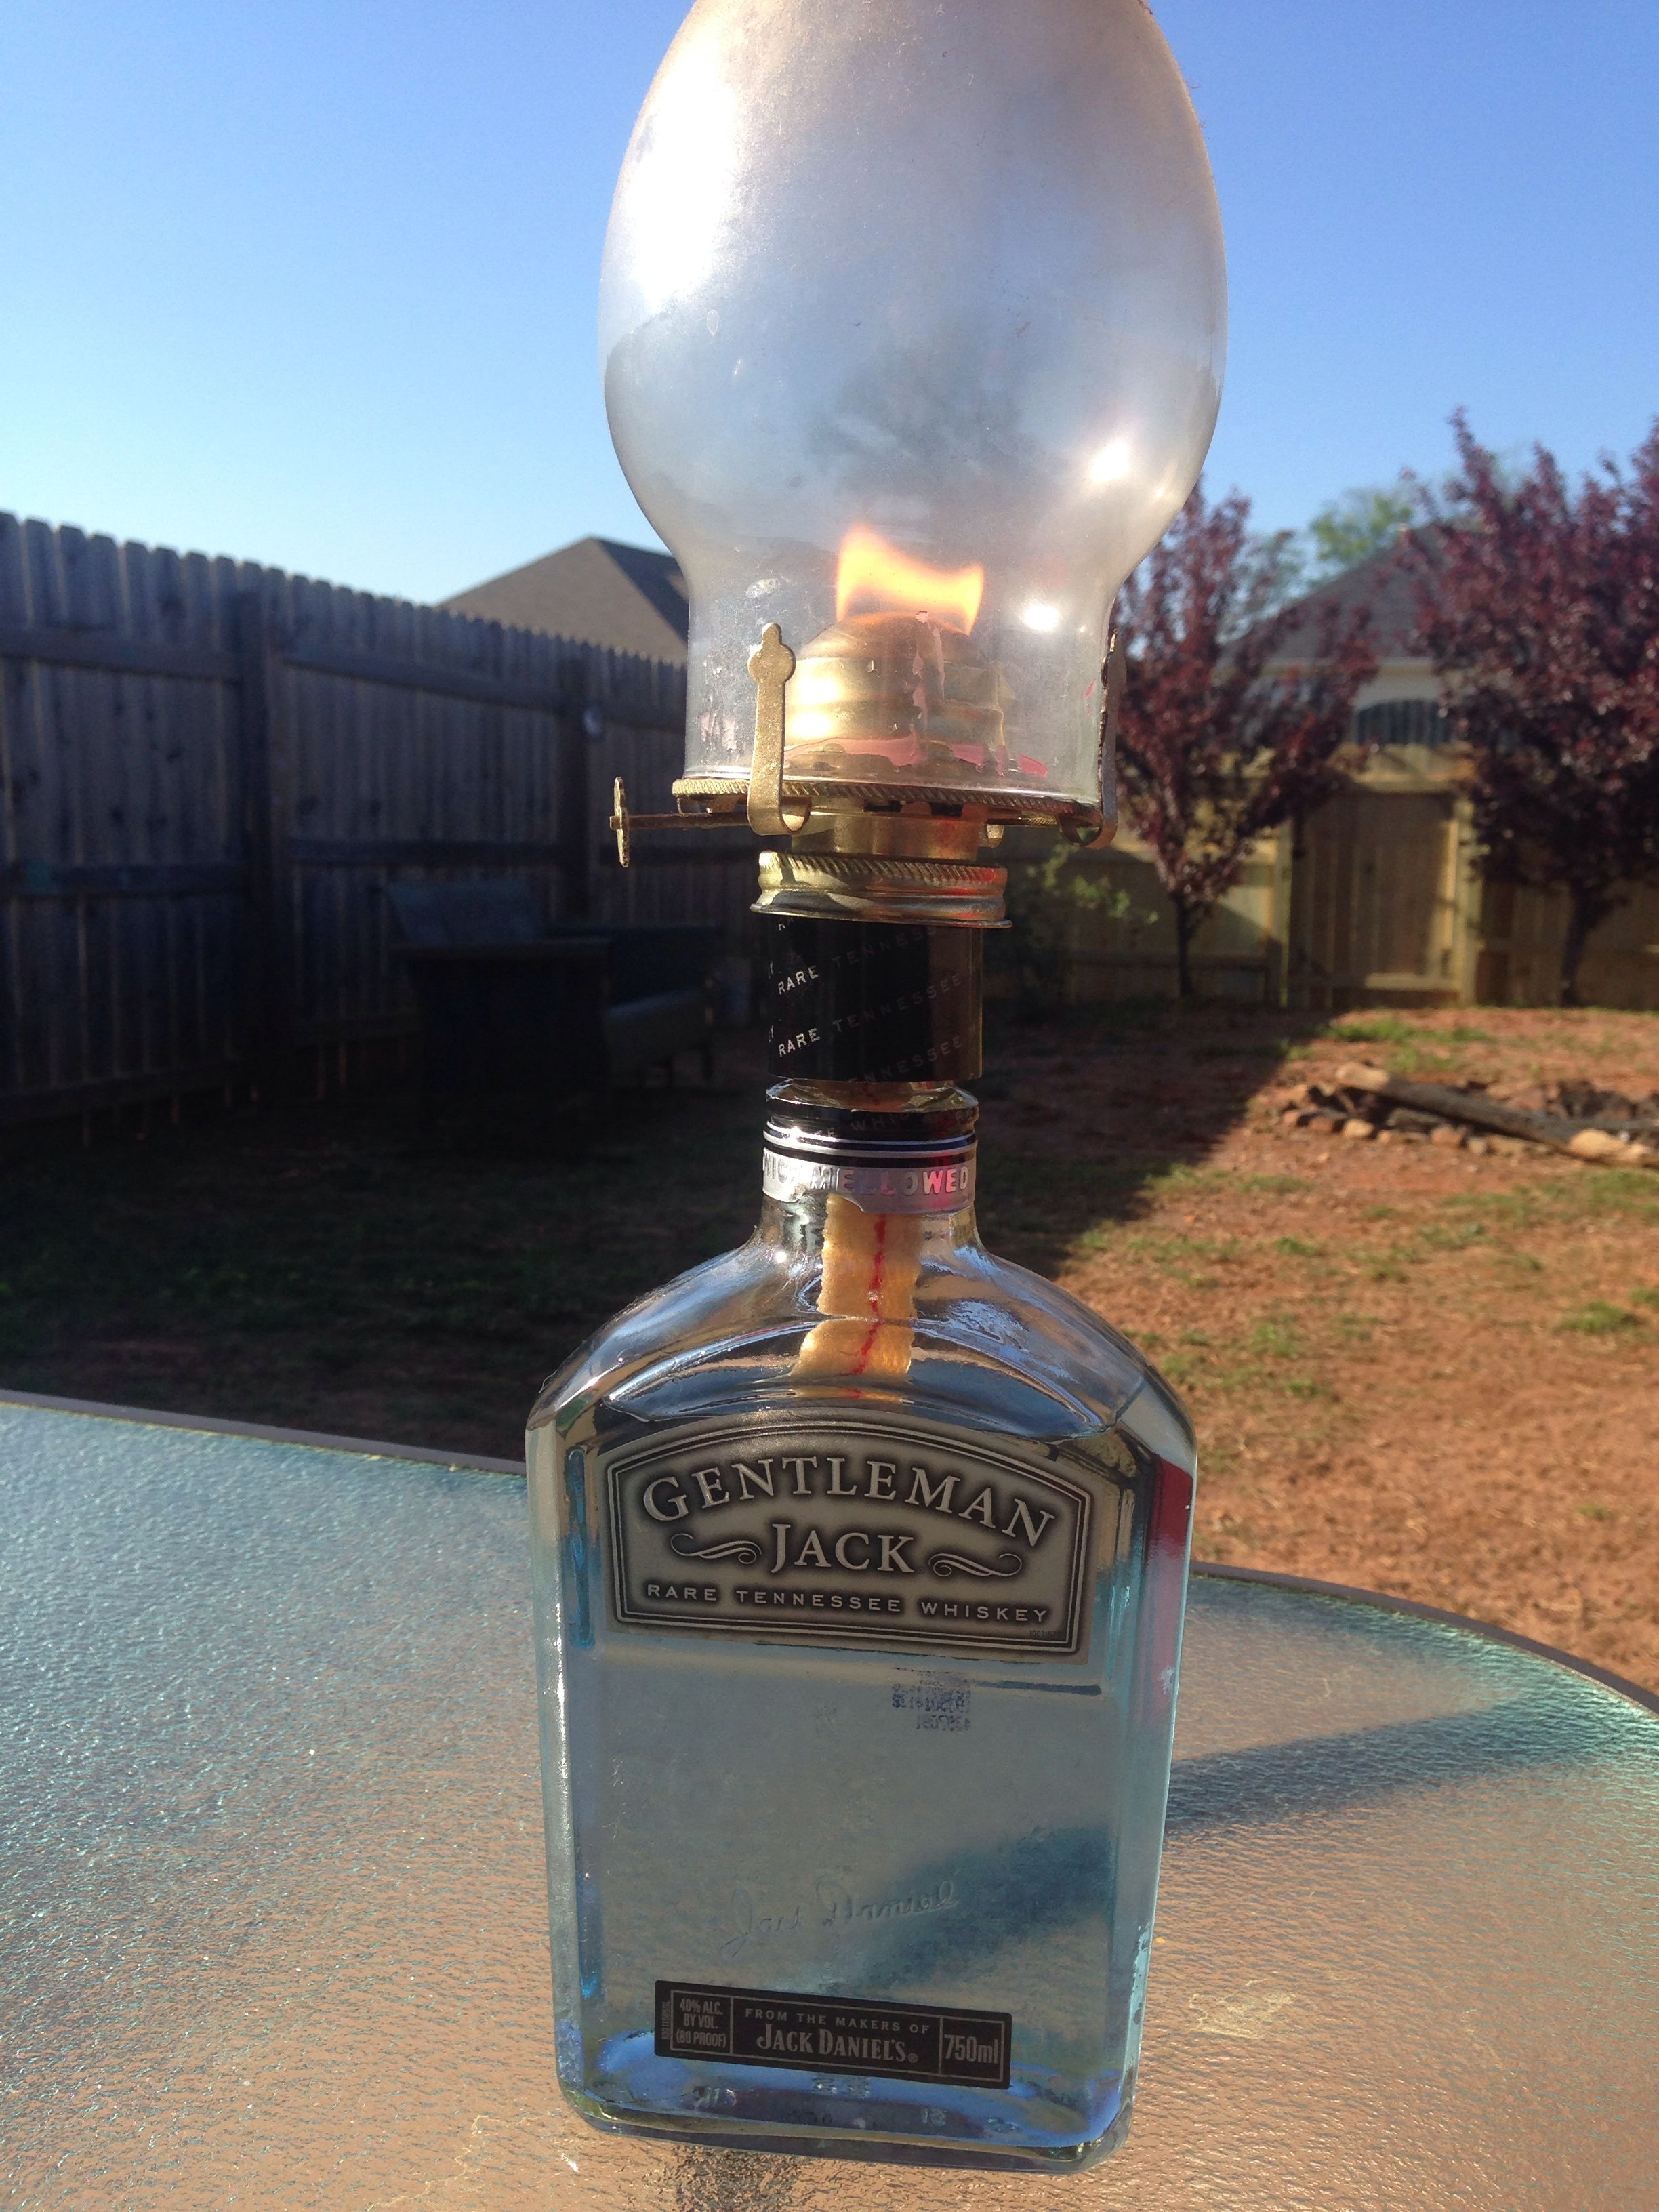 Jack Daniels lantern